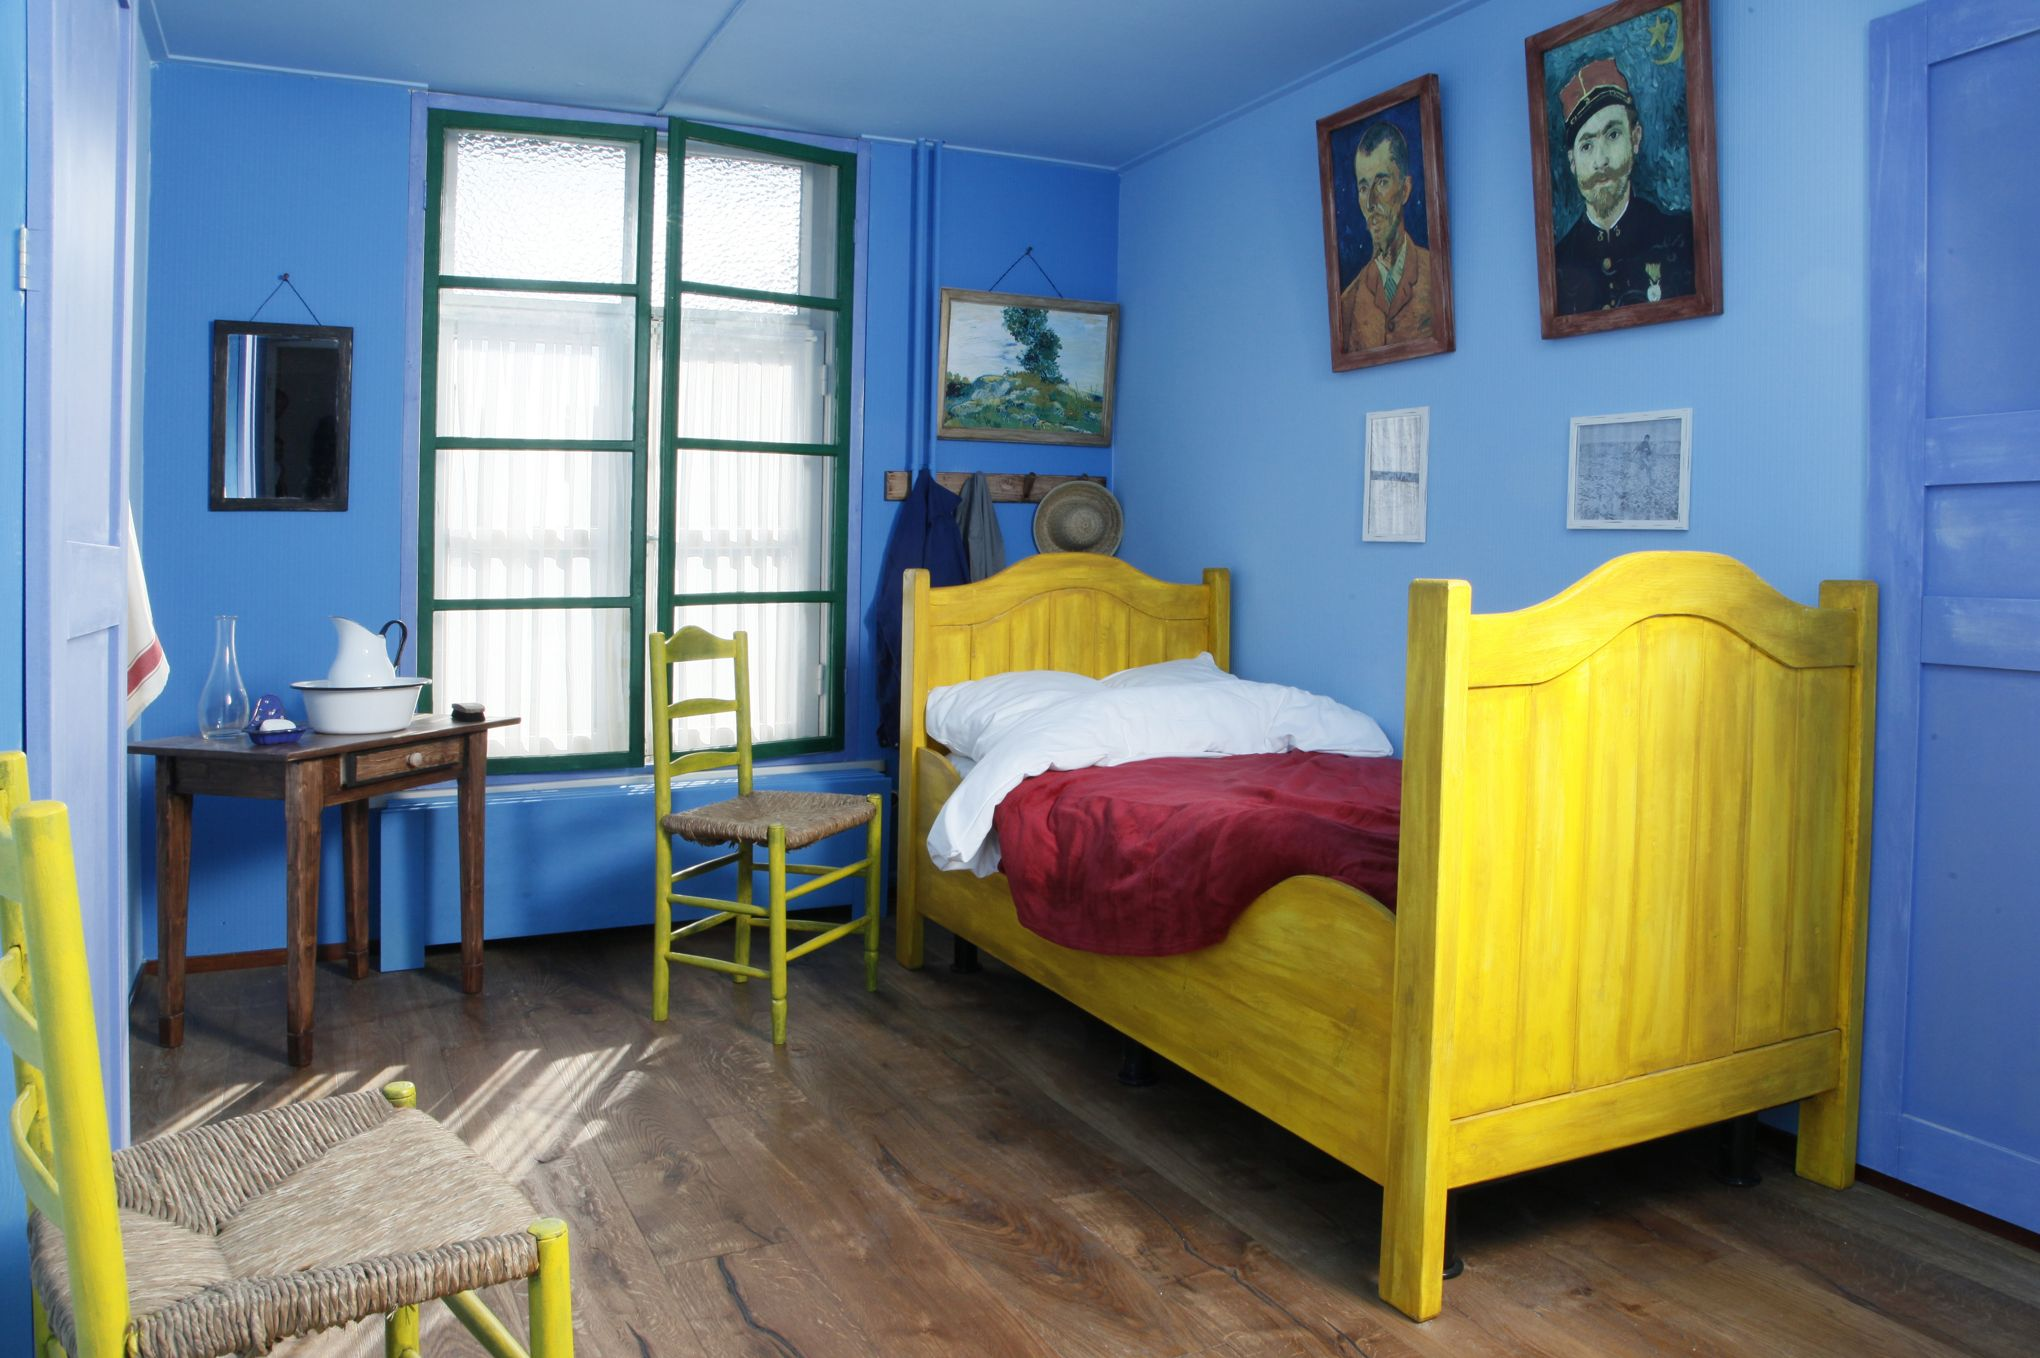 Dormir dans un tableau de van gogh - Tableau de van gogh la chambre ...